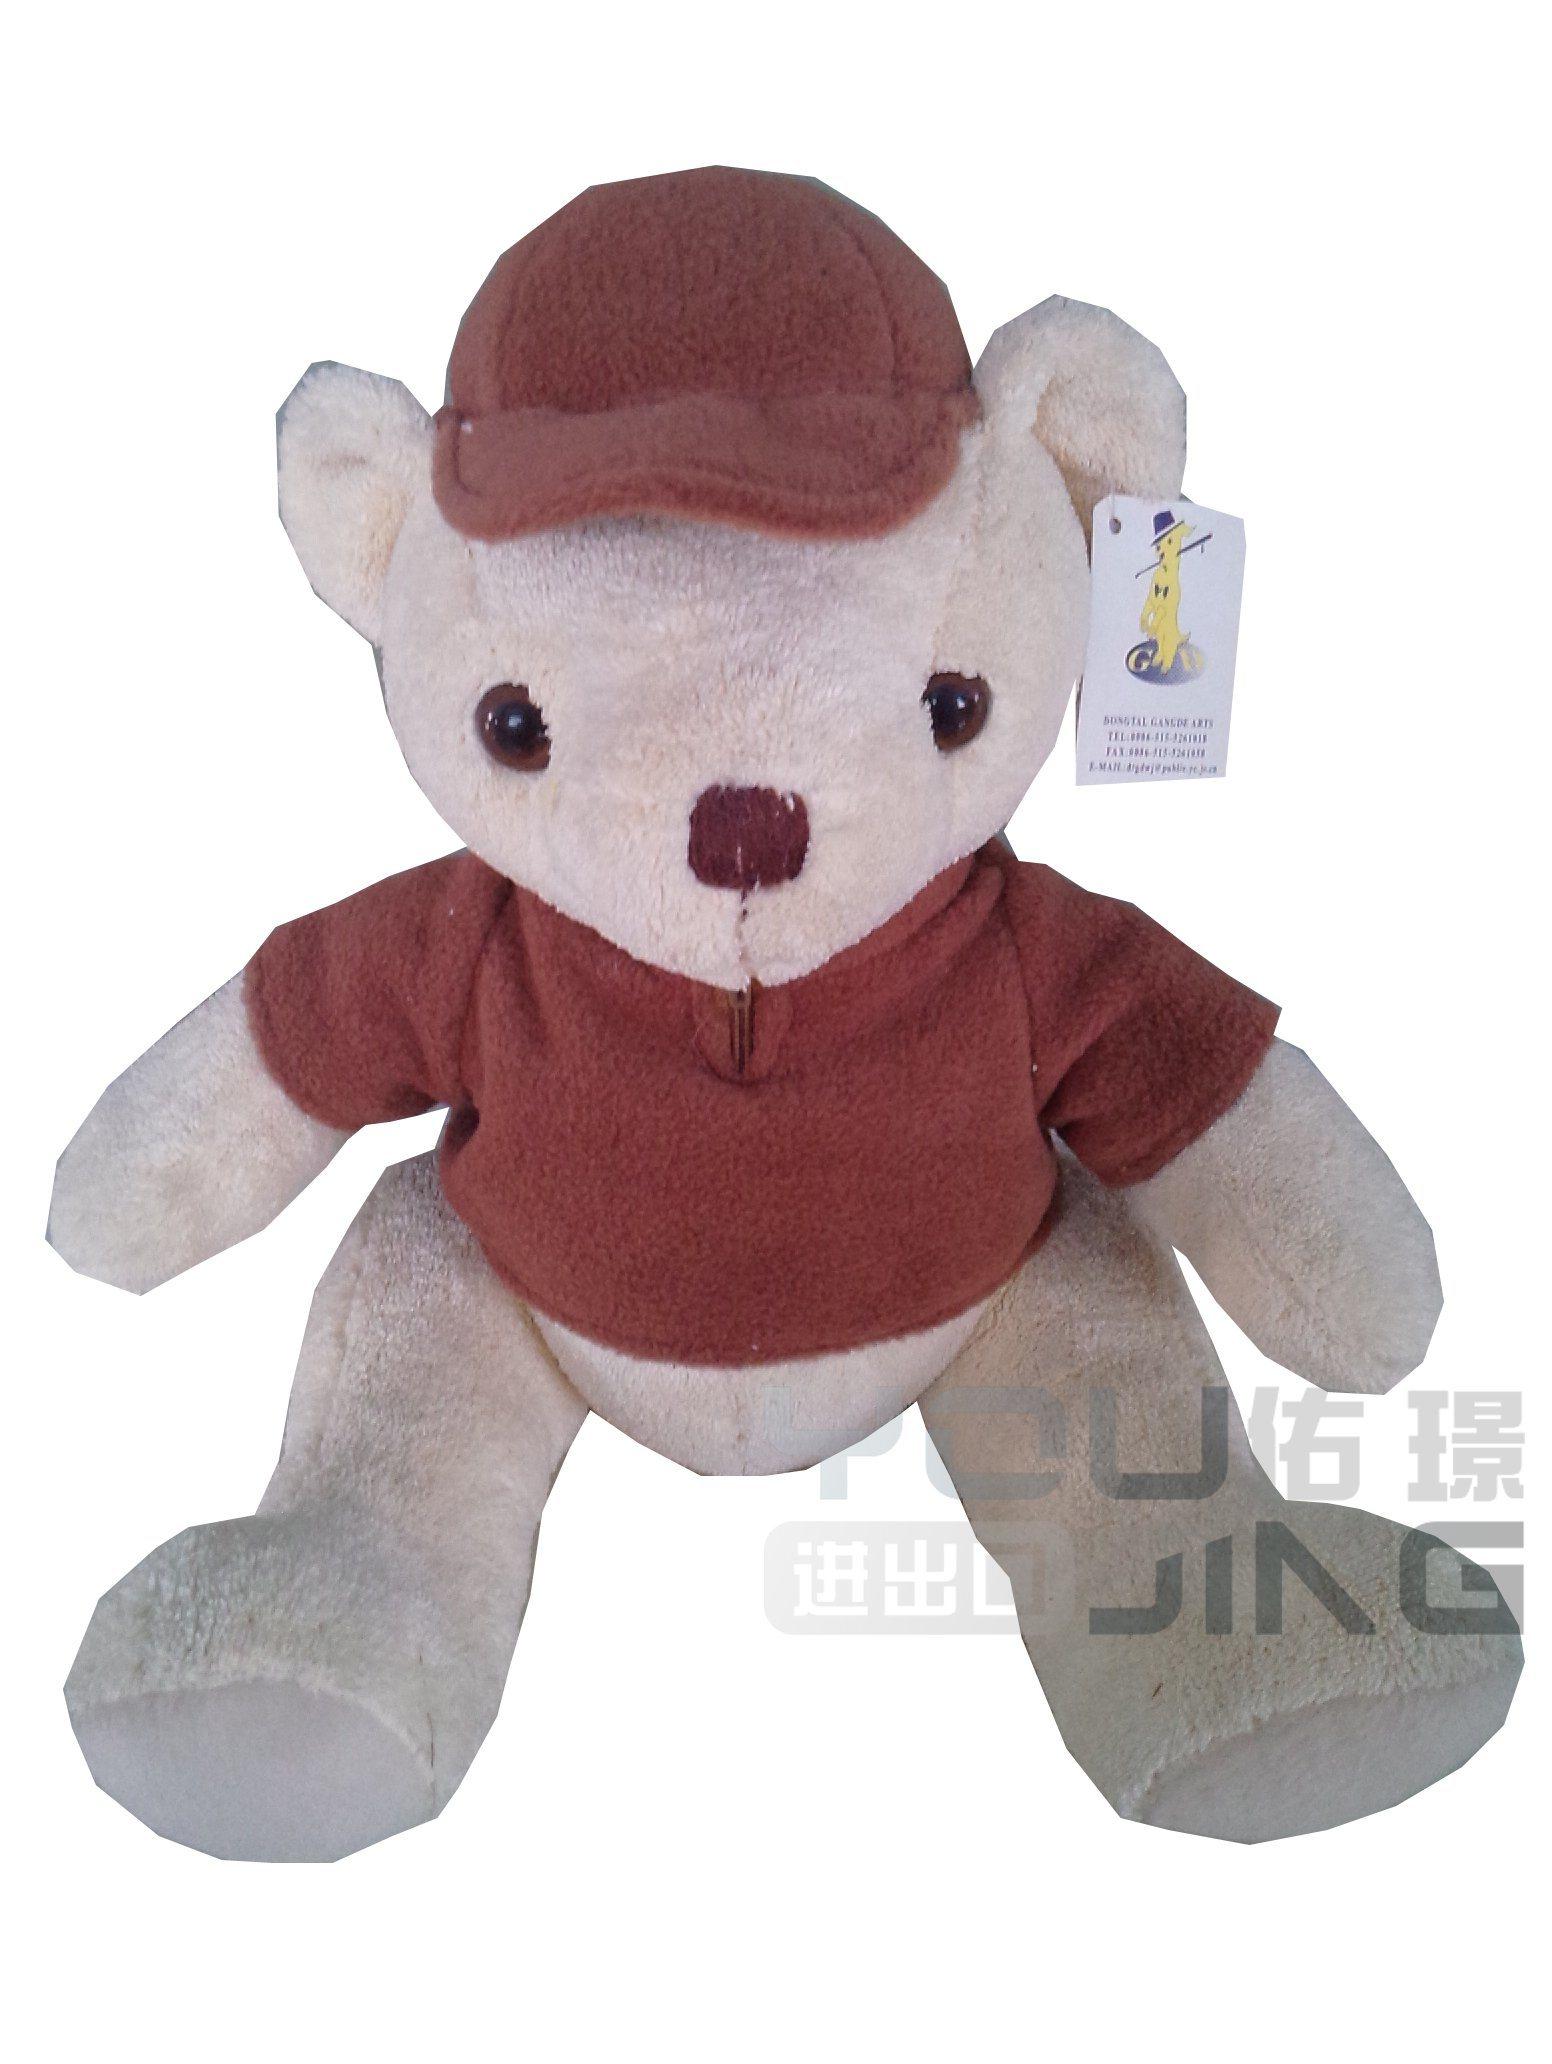 b37ad76dc7f8 China Custom Plush Teddy Bear Green Striped T-Shirt Photos ...